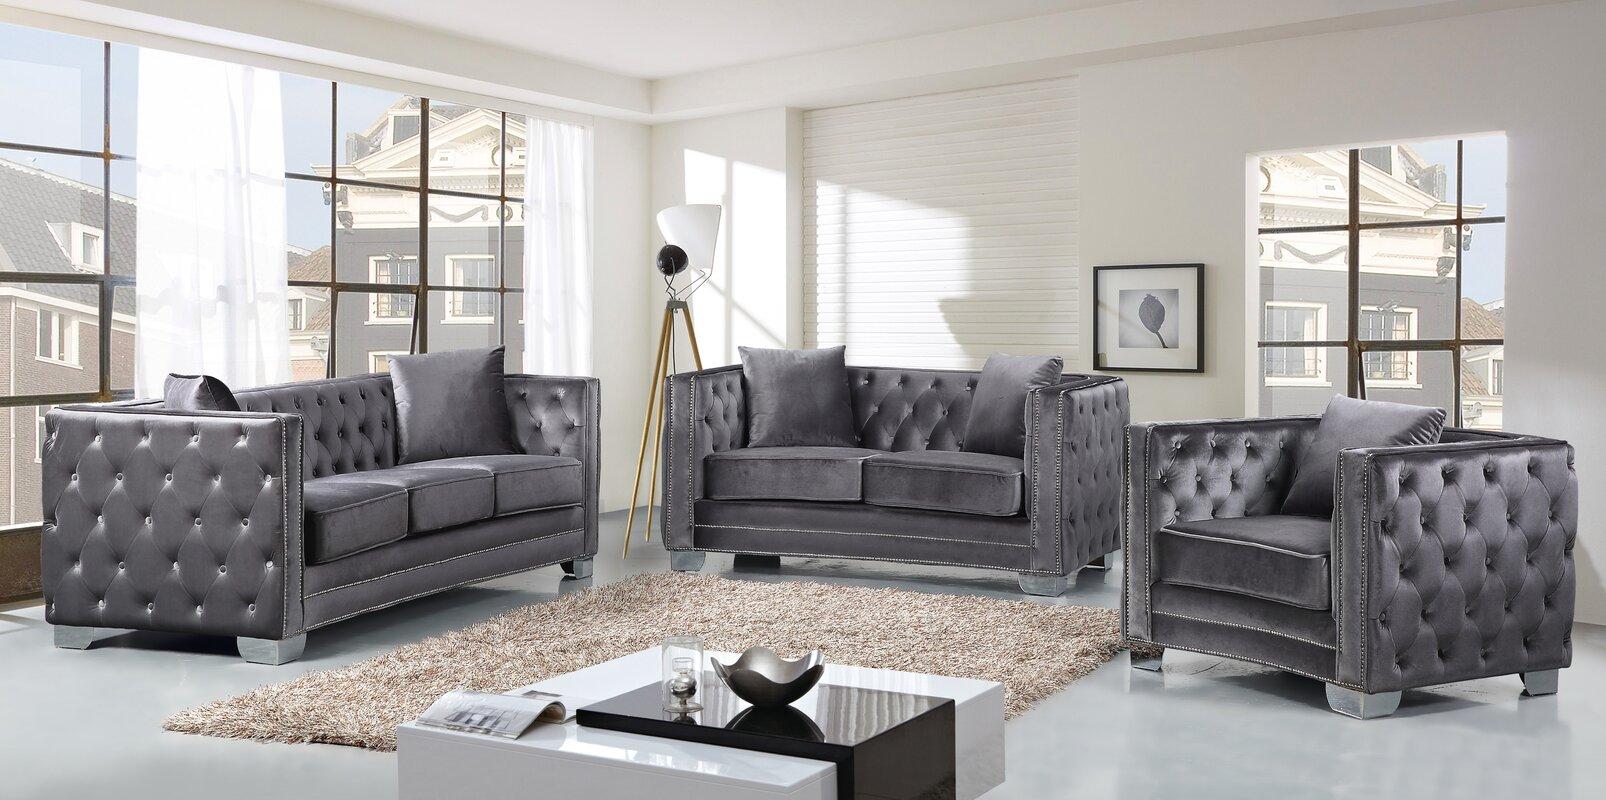 100 gray velvet chair mid century modern arm lounge chair w